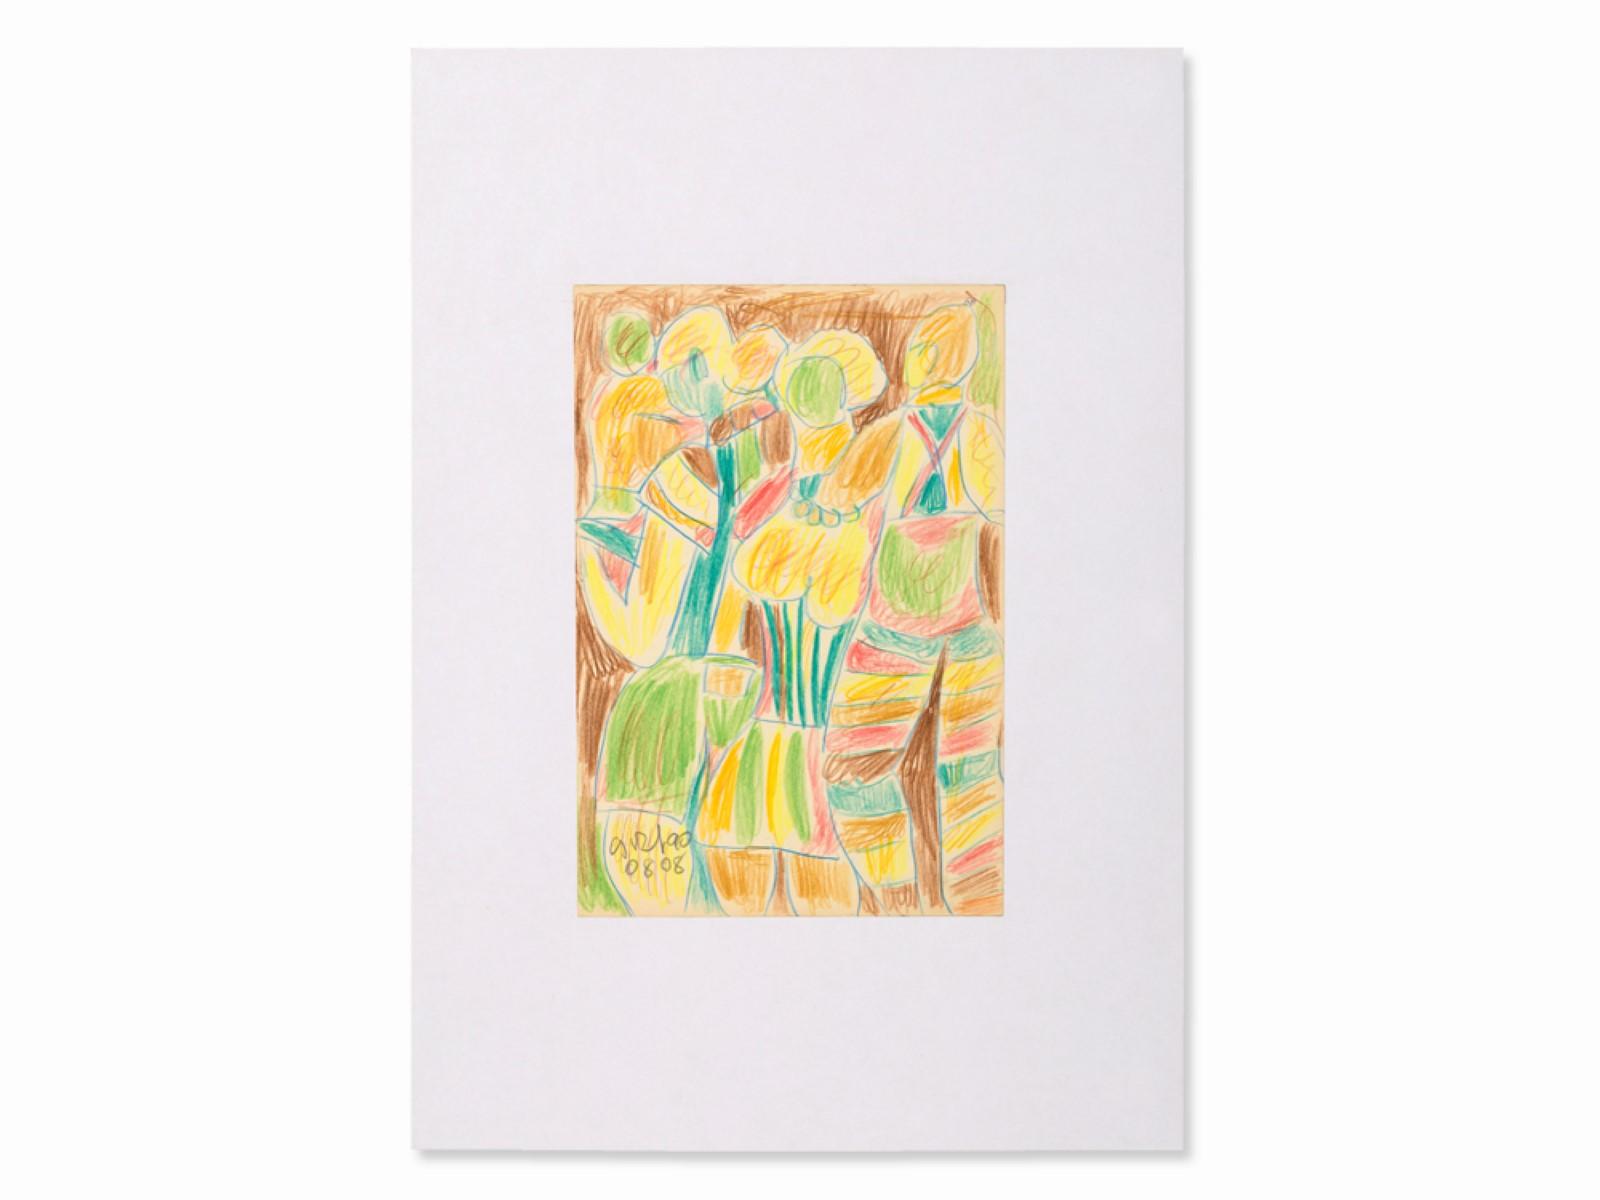 #27 Miklos Németh* (1934-2012), Colorful Figures, 2008   Miklos Németh* (1934-2012), Bunte Figuren, 2008 Image